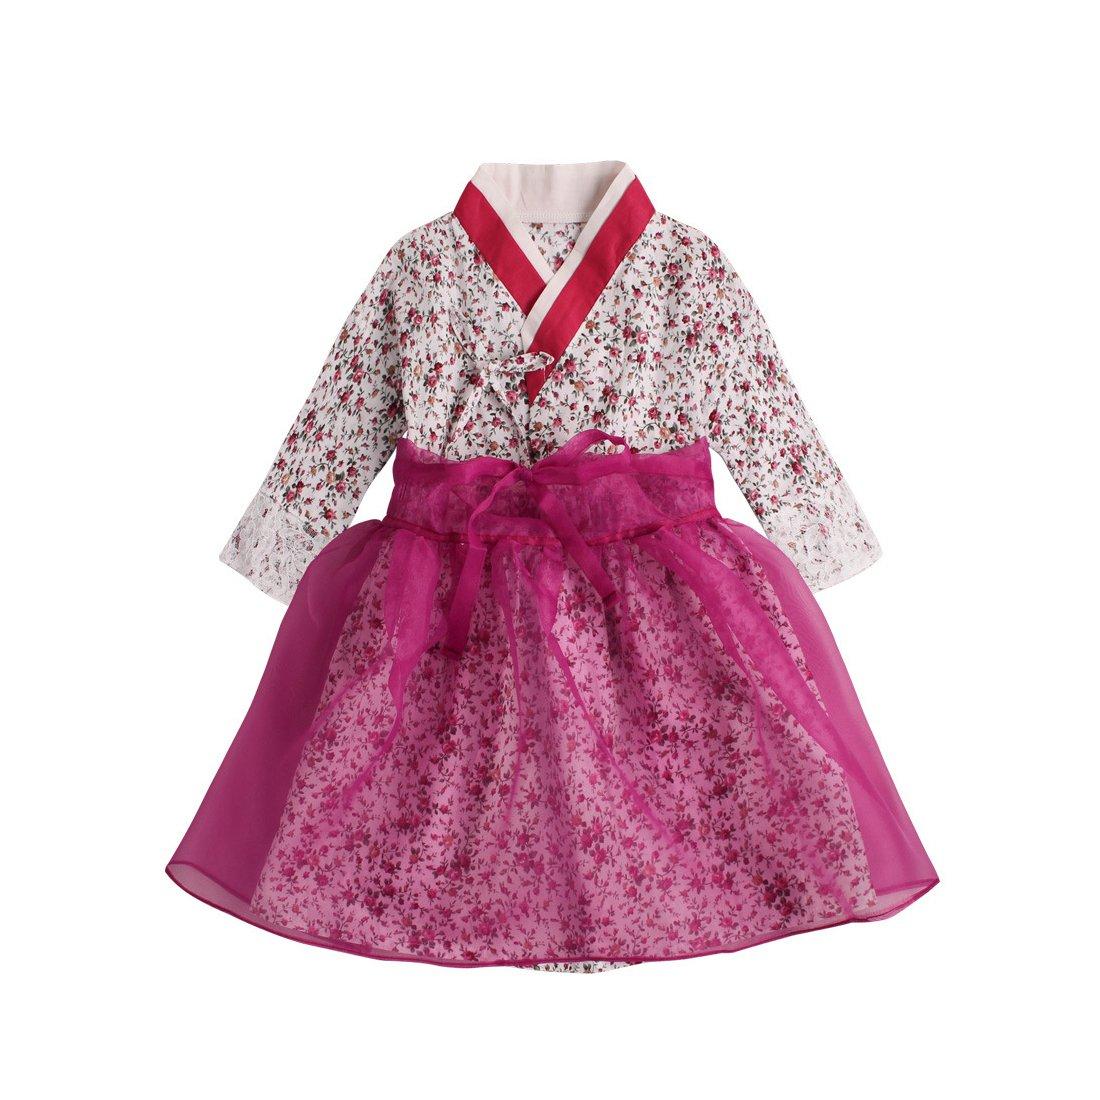 PAUBOLI Baby Girl Korean Clothes Korean Hanbok Long Sleeve Dress